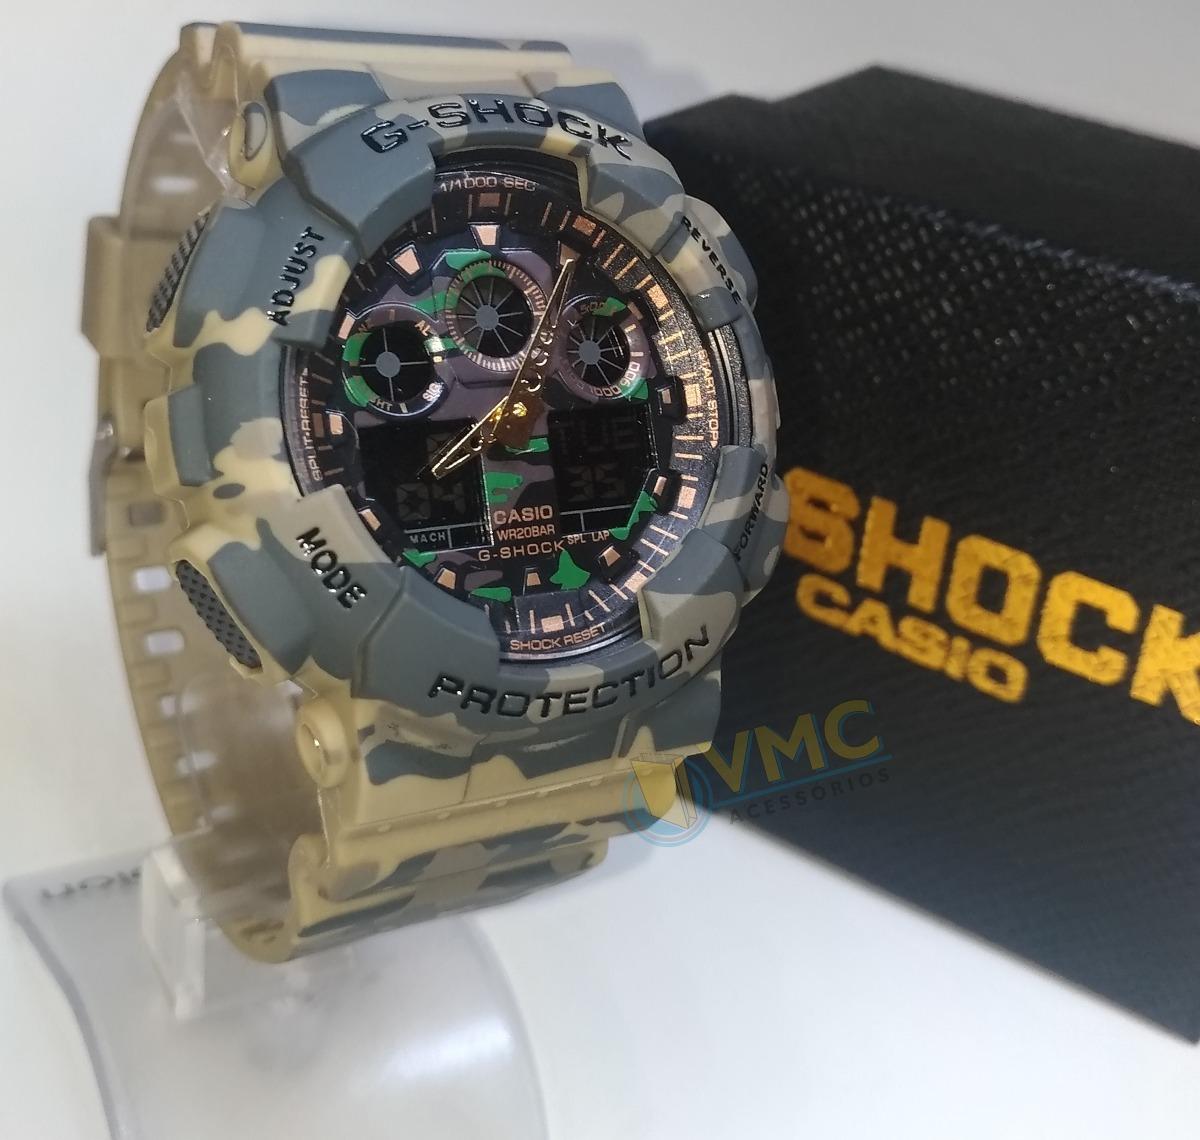 ba07b4242a3 Relógio A Prova D´água Masculino Pronta Entrega Barato Promo - R  79 ...